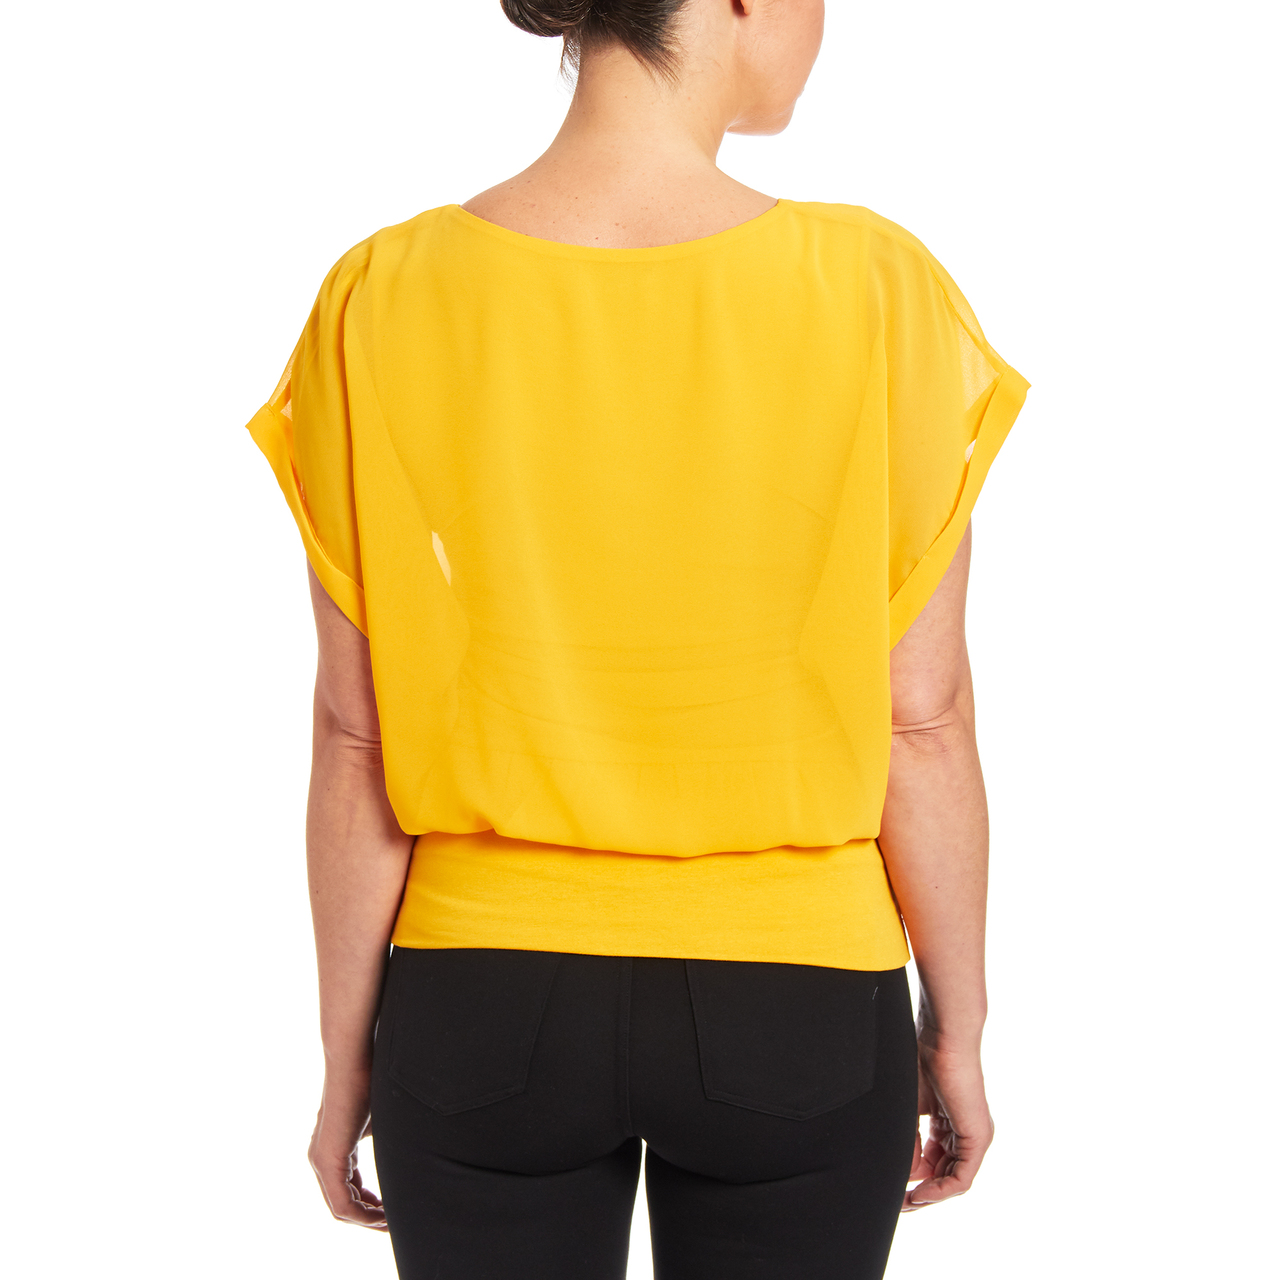 Dolman Short Sleeve Blouse in Daffodil